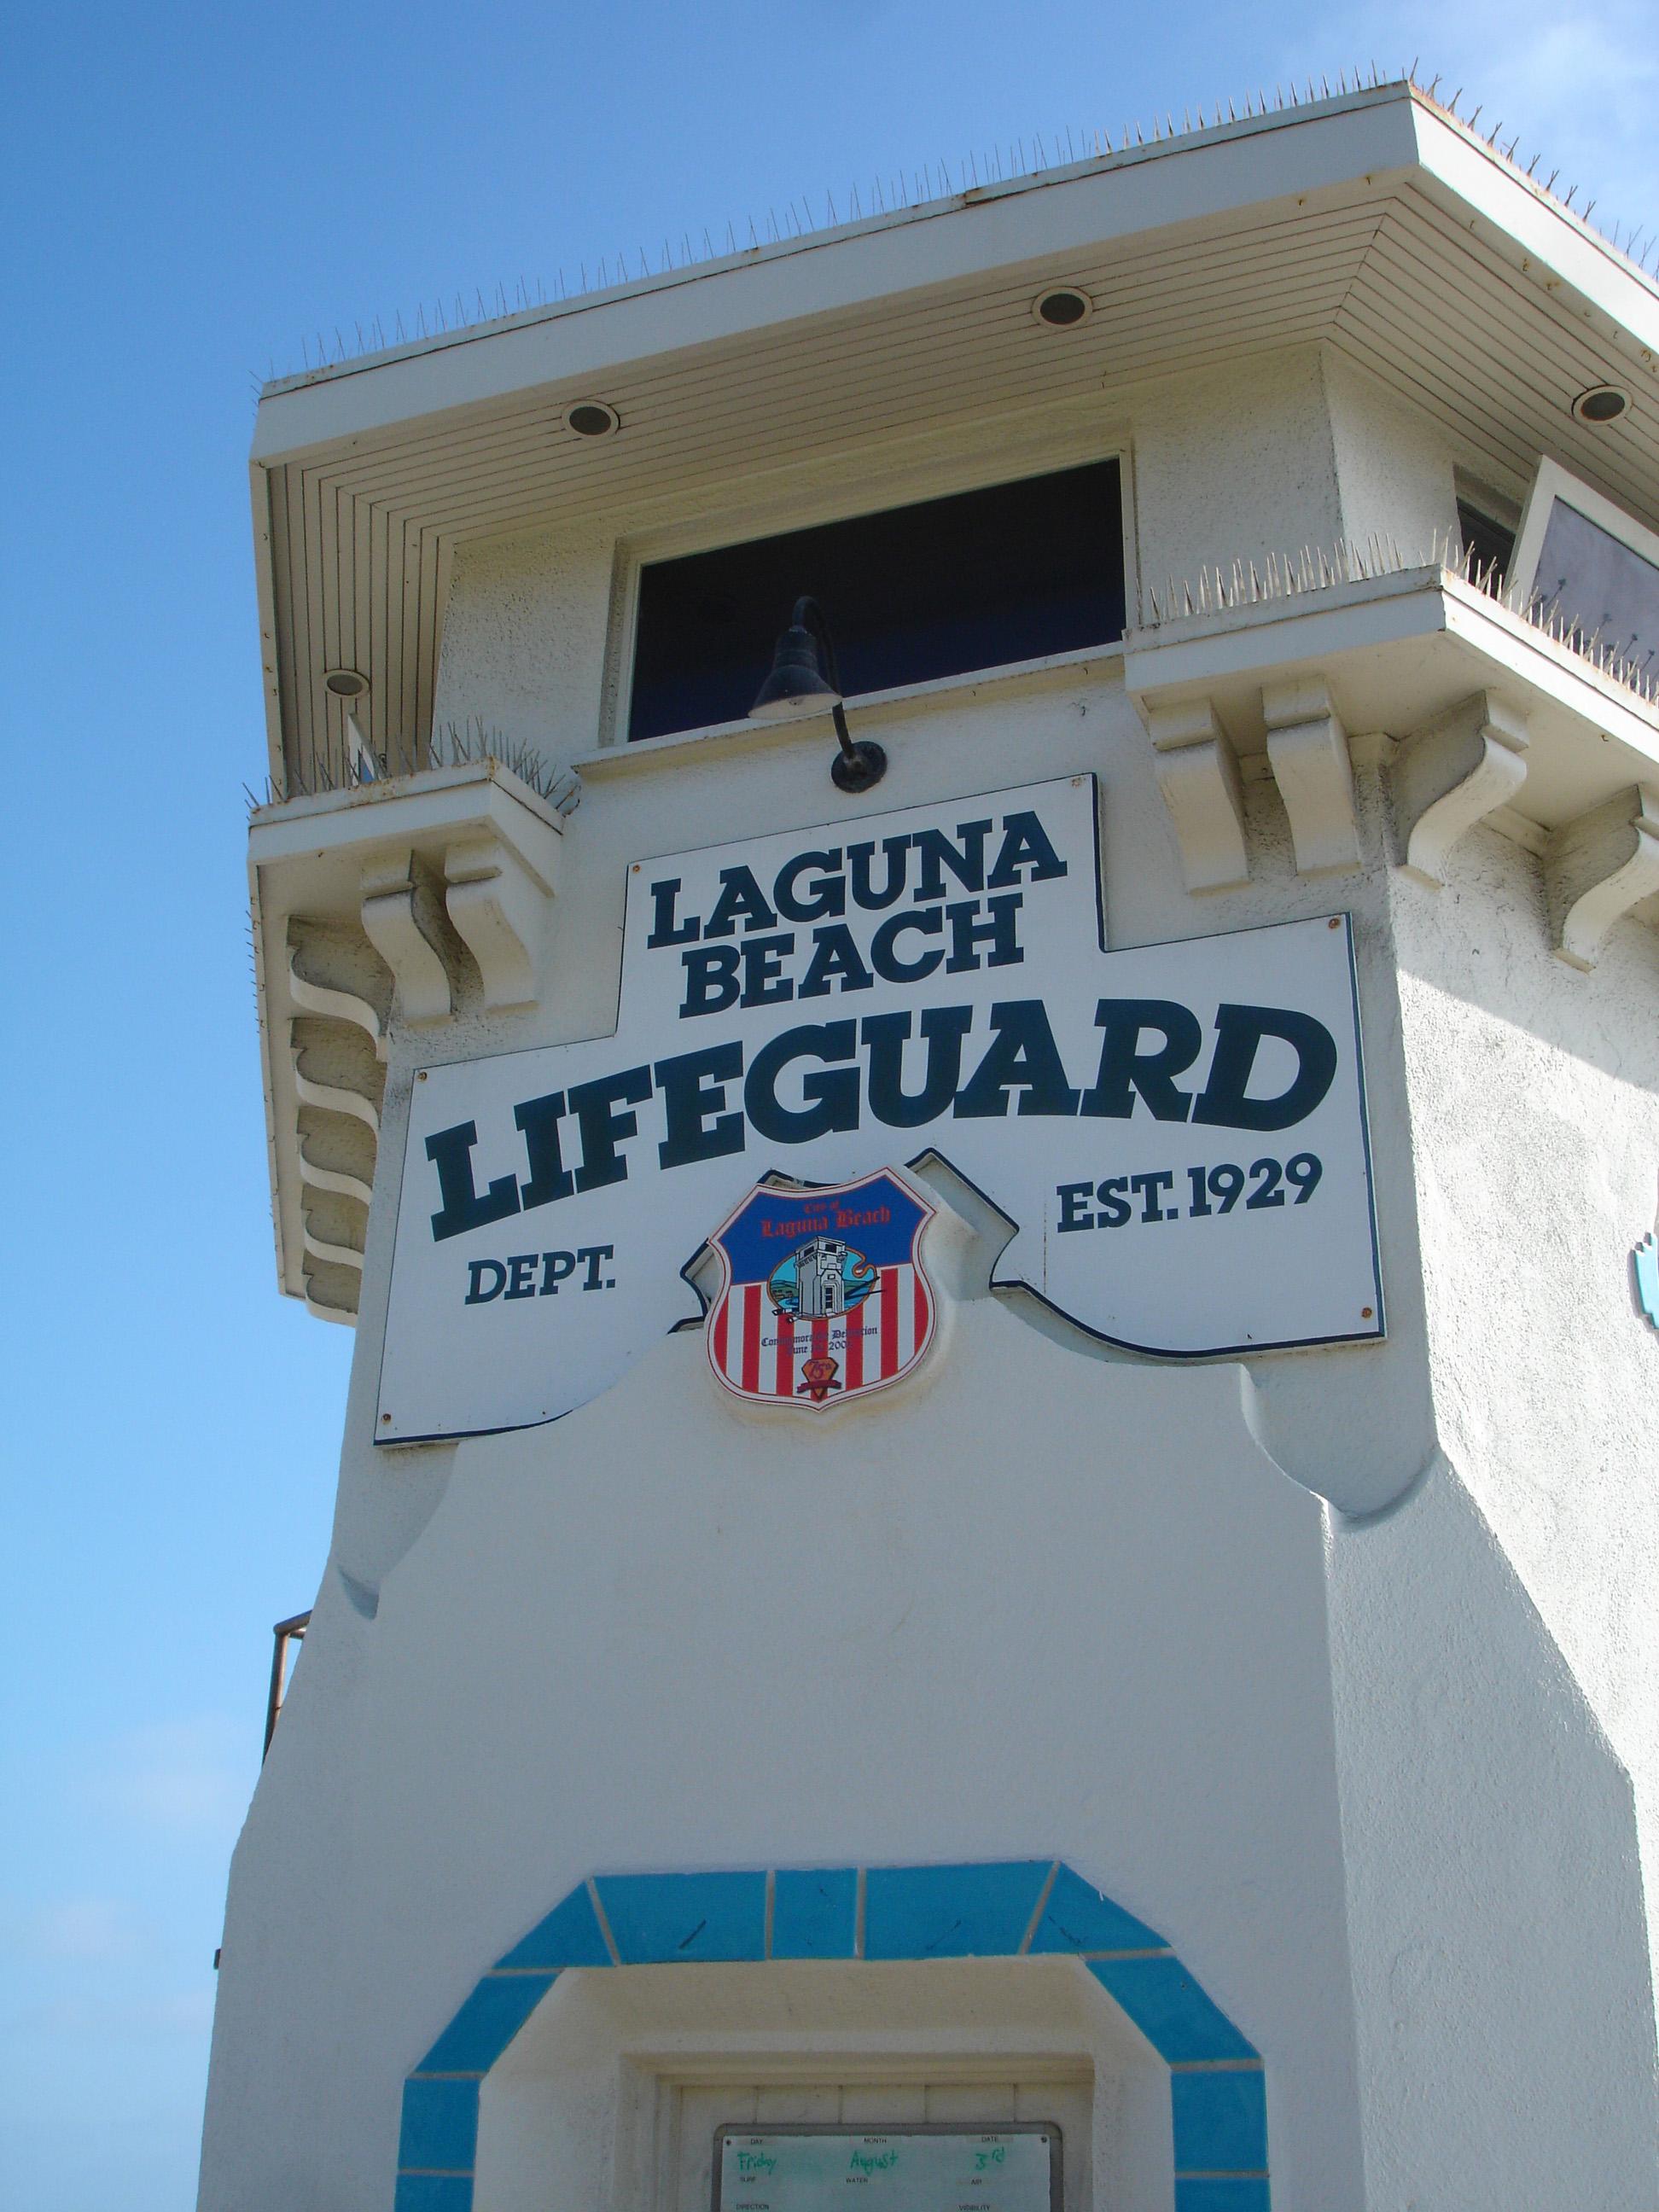 Laguna Beach Lifeguard, Beach, California, Guard, Lifeguard, HQ Photo